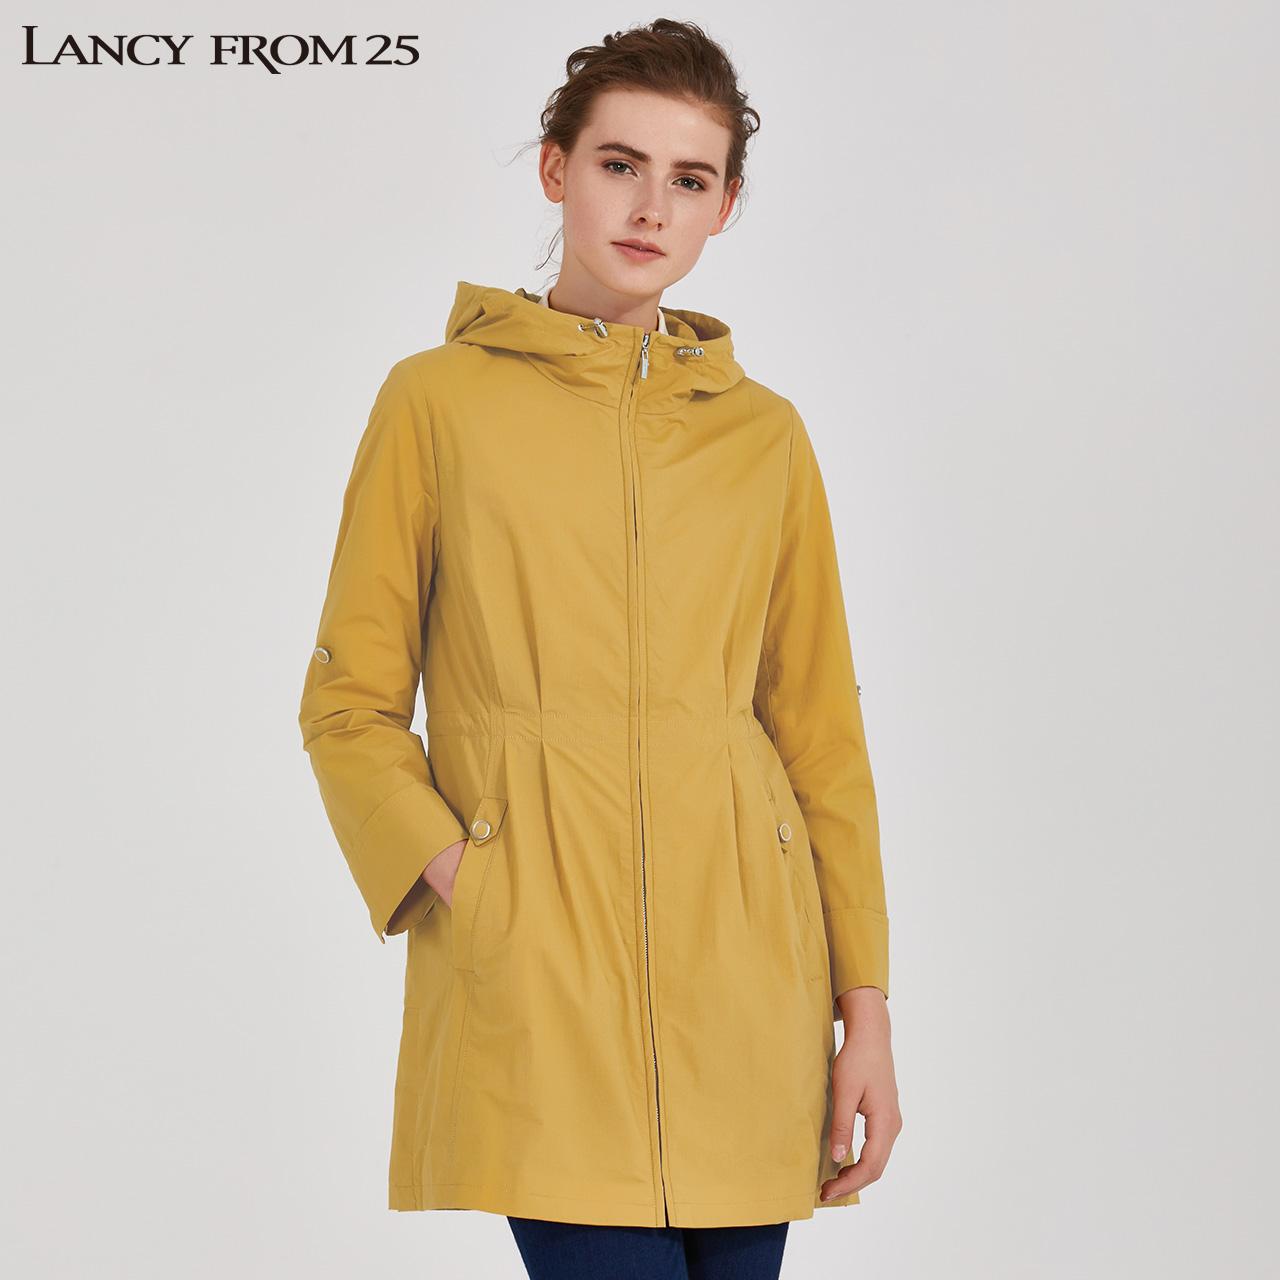 LANCY朗姿秋季女裝簡約時尚腰帶連帽風衣休閑寬松長袖外套